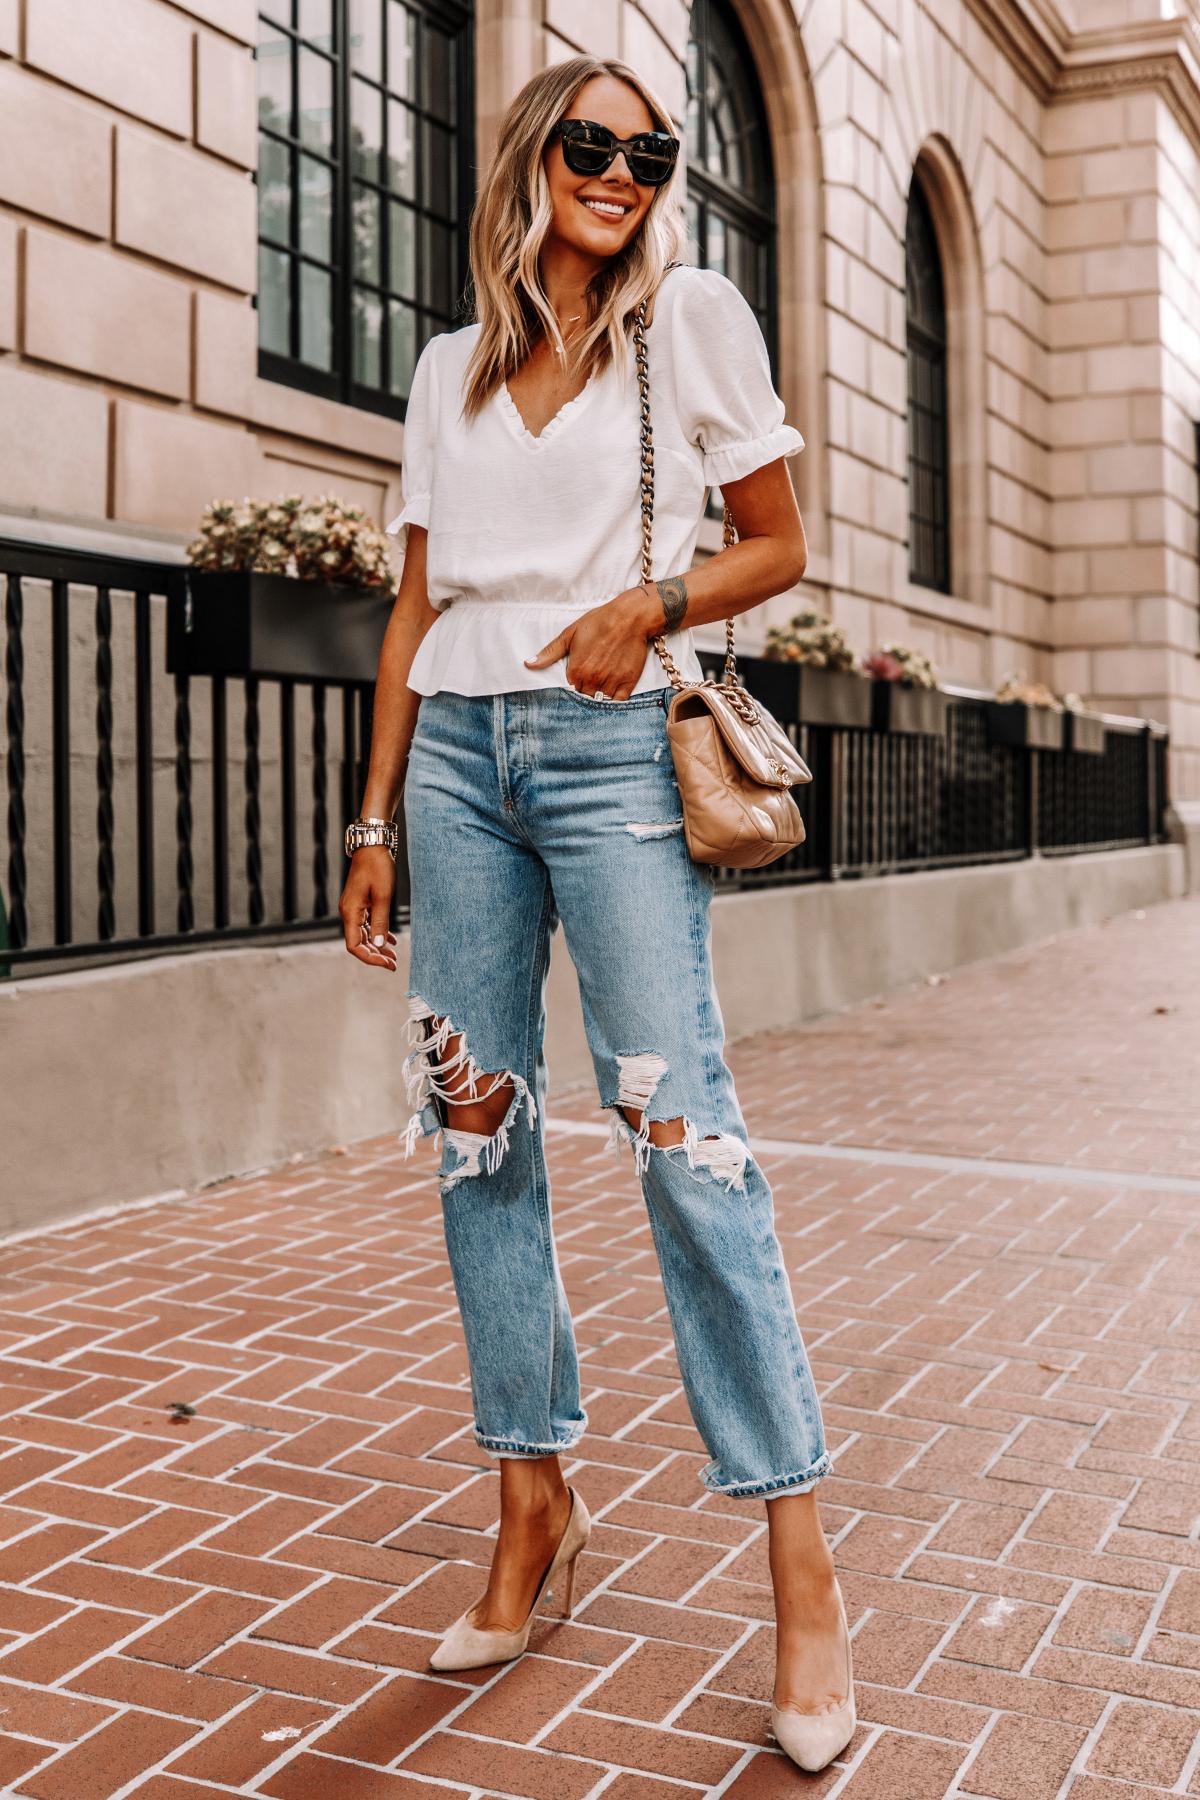 Fashion Jackson Wearing Topshop White Peplum Top AGOLDE Ripped 90s Jeans Nude Pumps Chanel 19 Beige Handbag 2